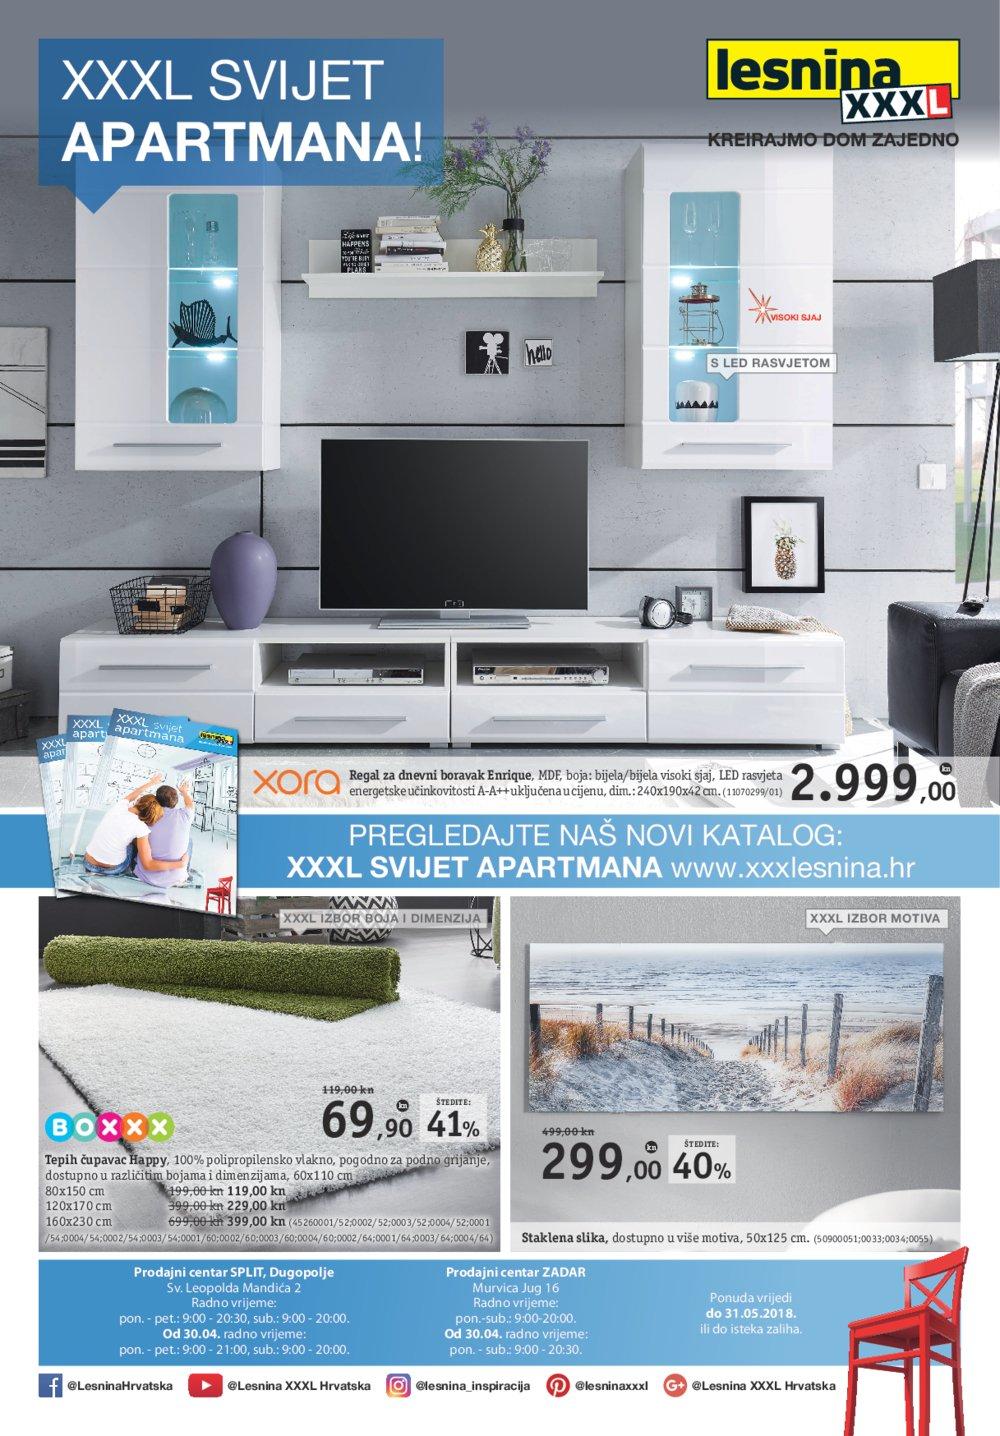 Lesnina letak XXXL Svijet apartmana 18.04.-31.05.2018